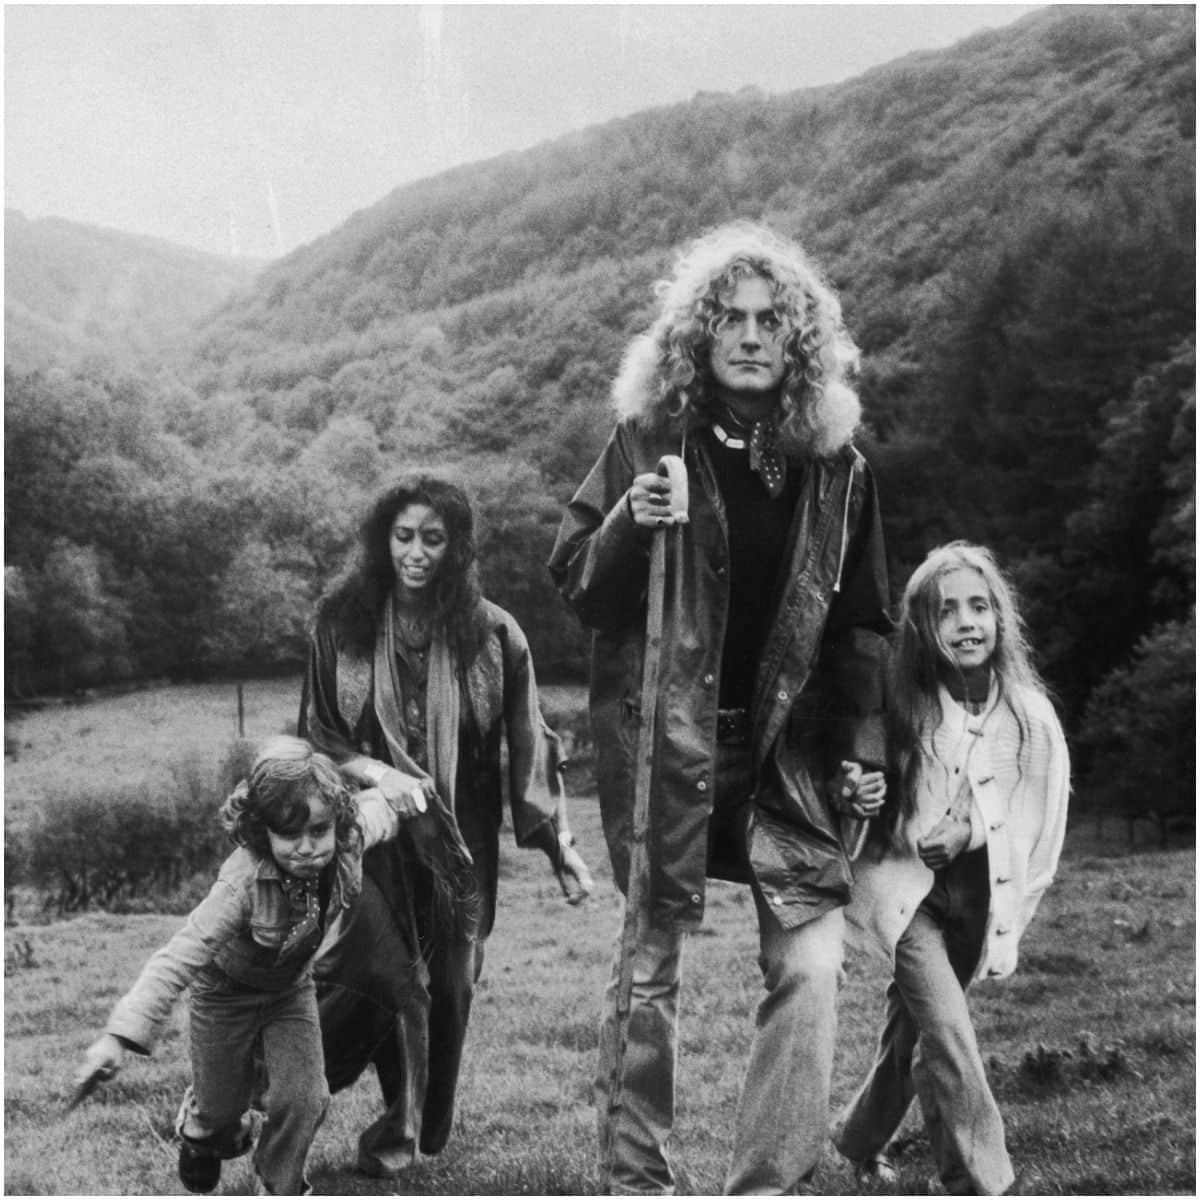 Robert Plant and wife Maureen Wilson